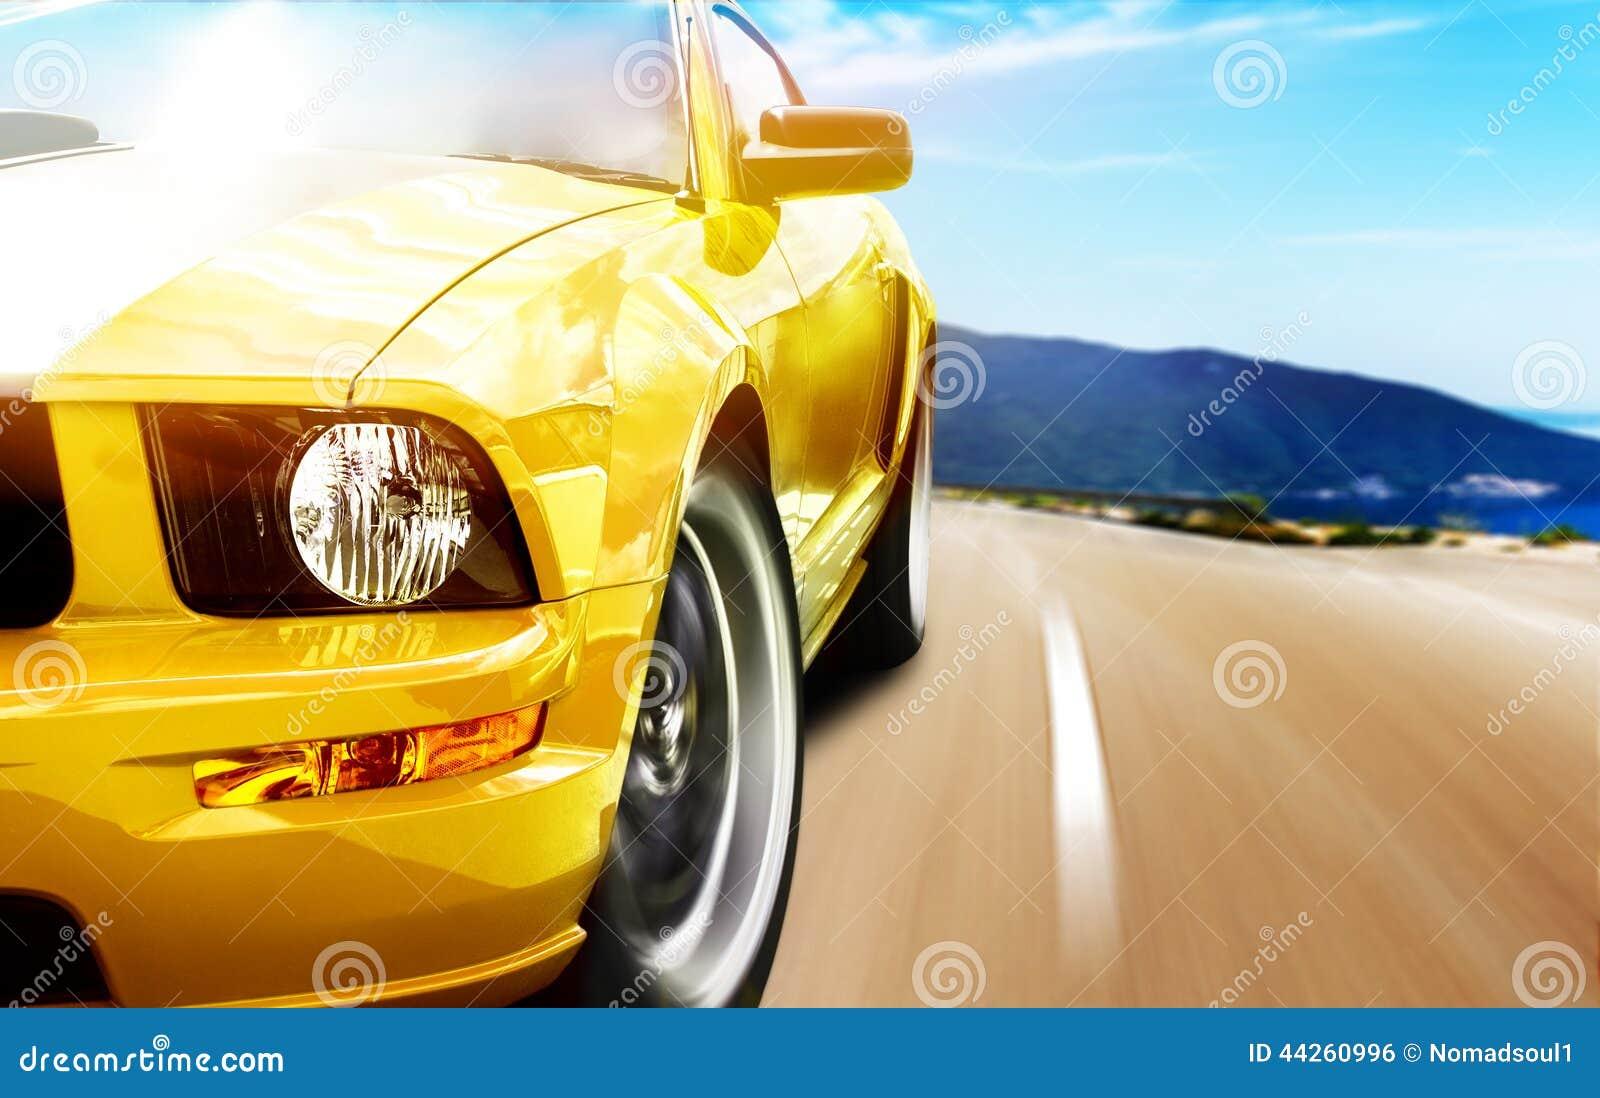 Желтая машина фото 3